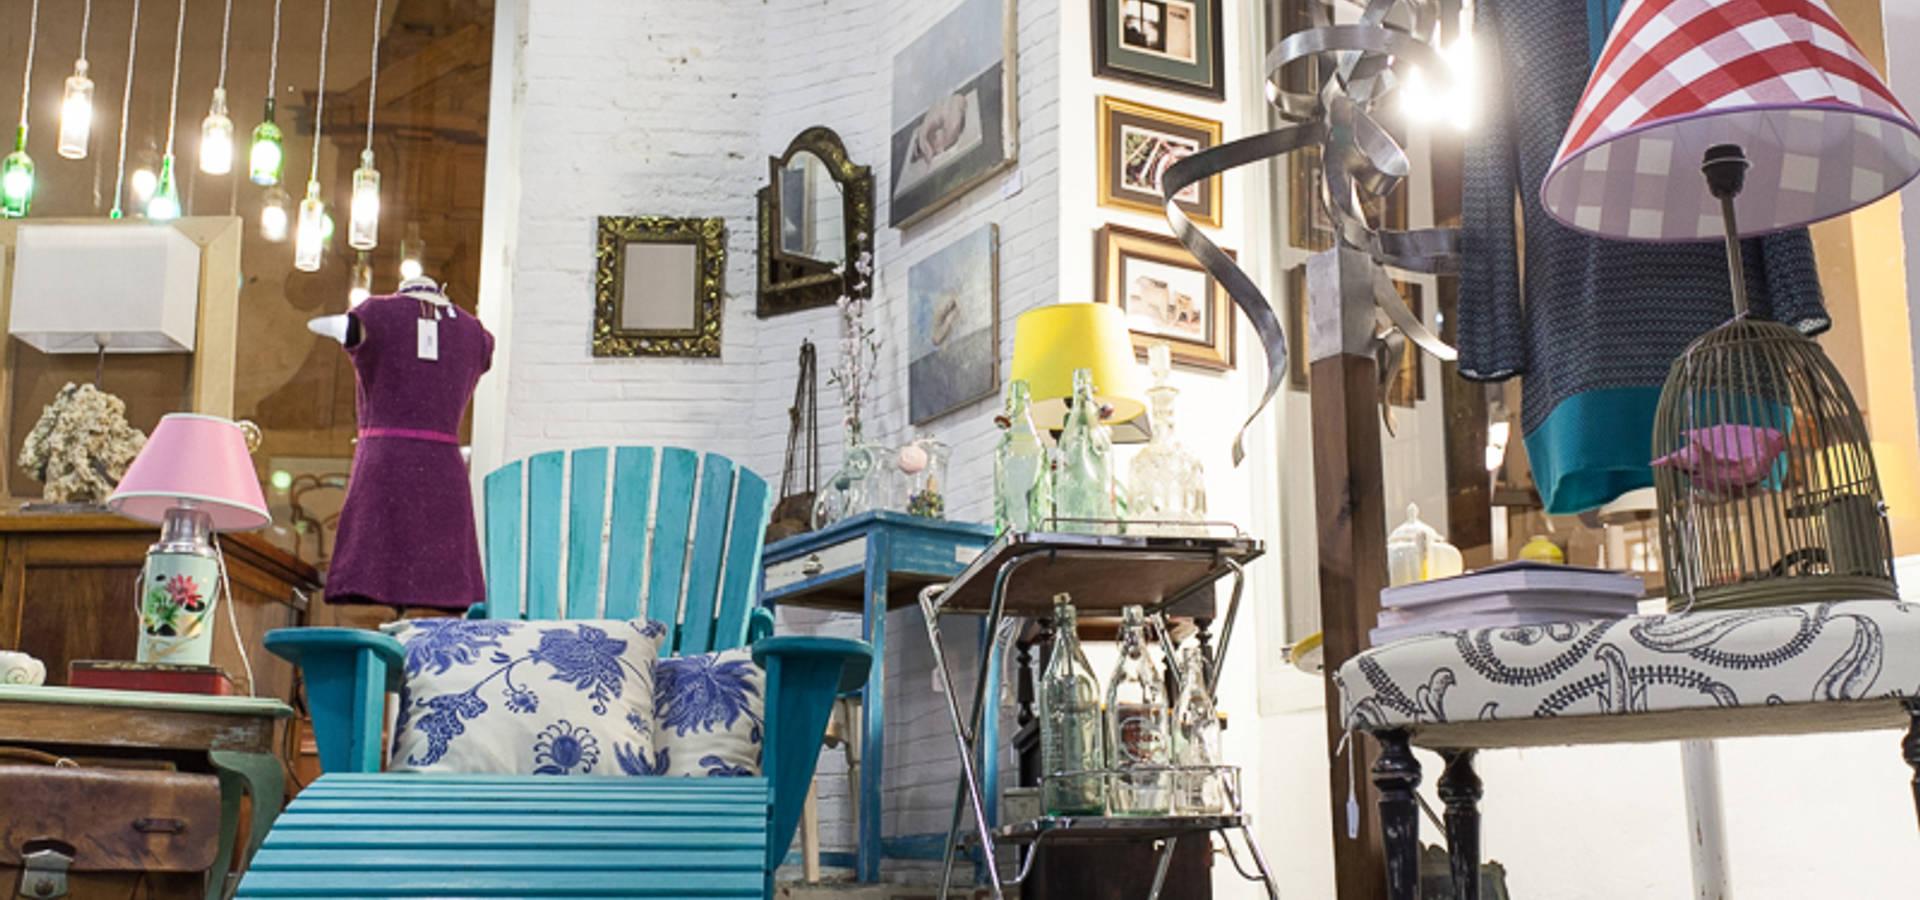 Wabi Sabi Shop Gallery